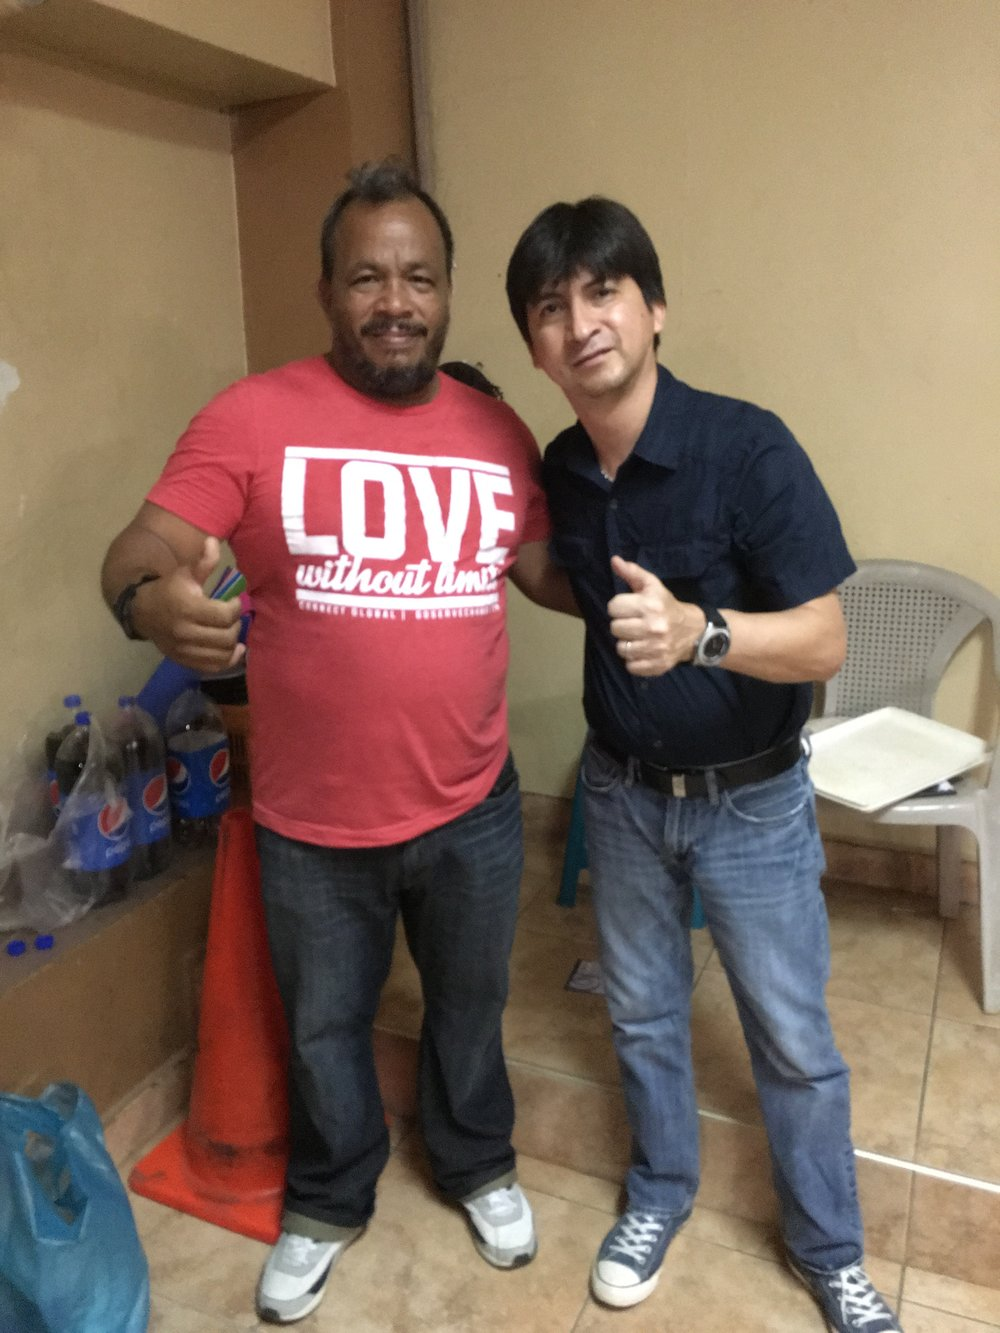 Connect Global National Director in Honduras Jorge Amador with Pastor Milton Valle of Puerta del Cielo in La Ceiba, Honduras.